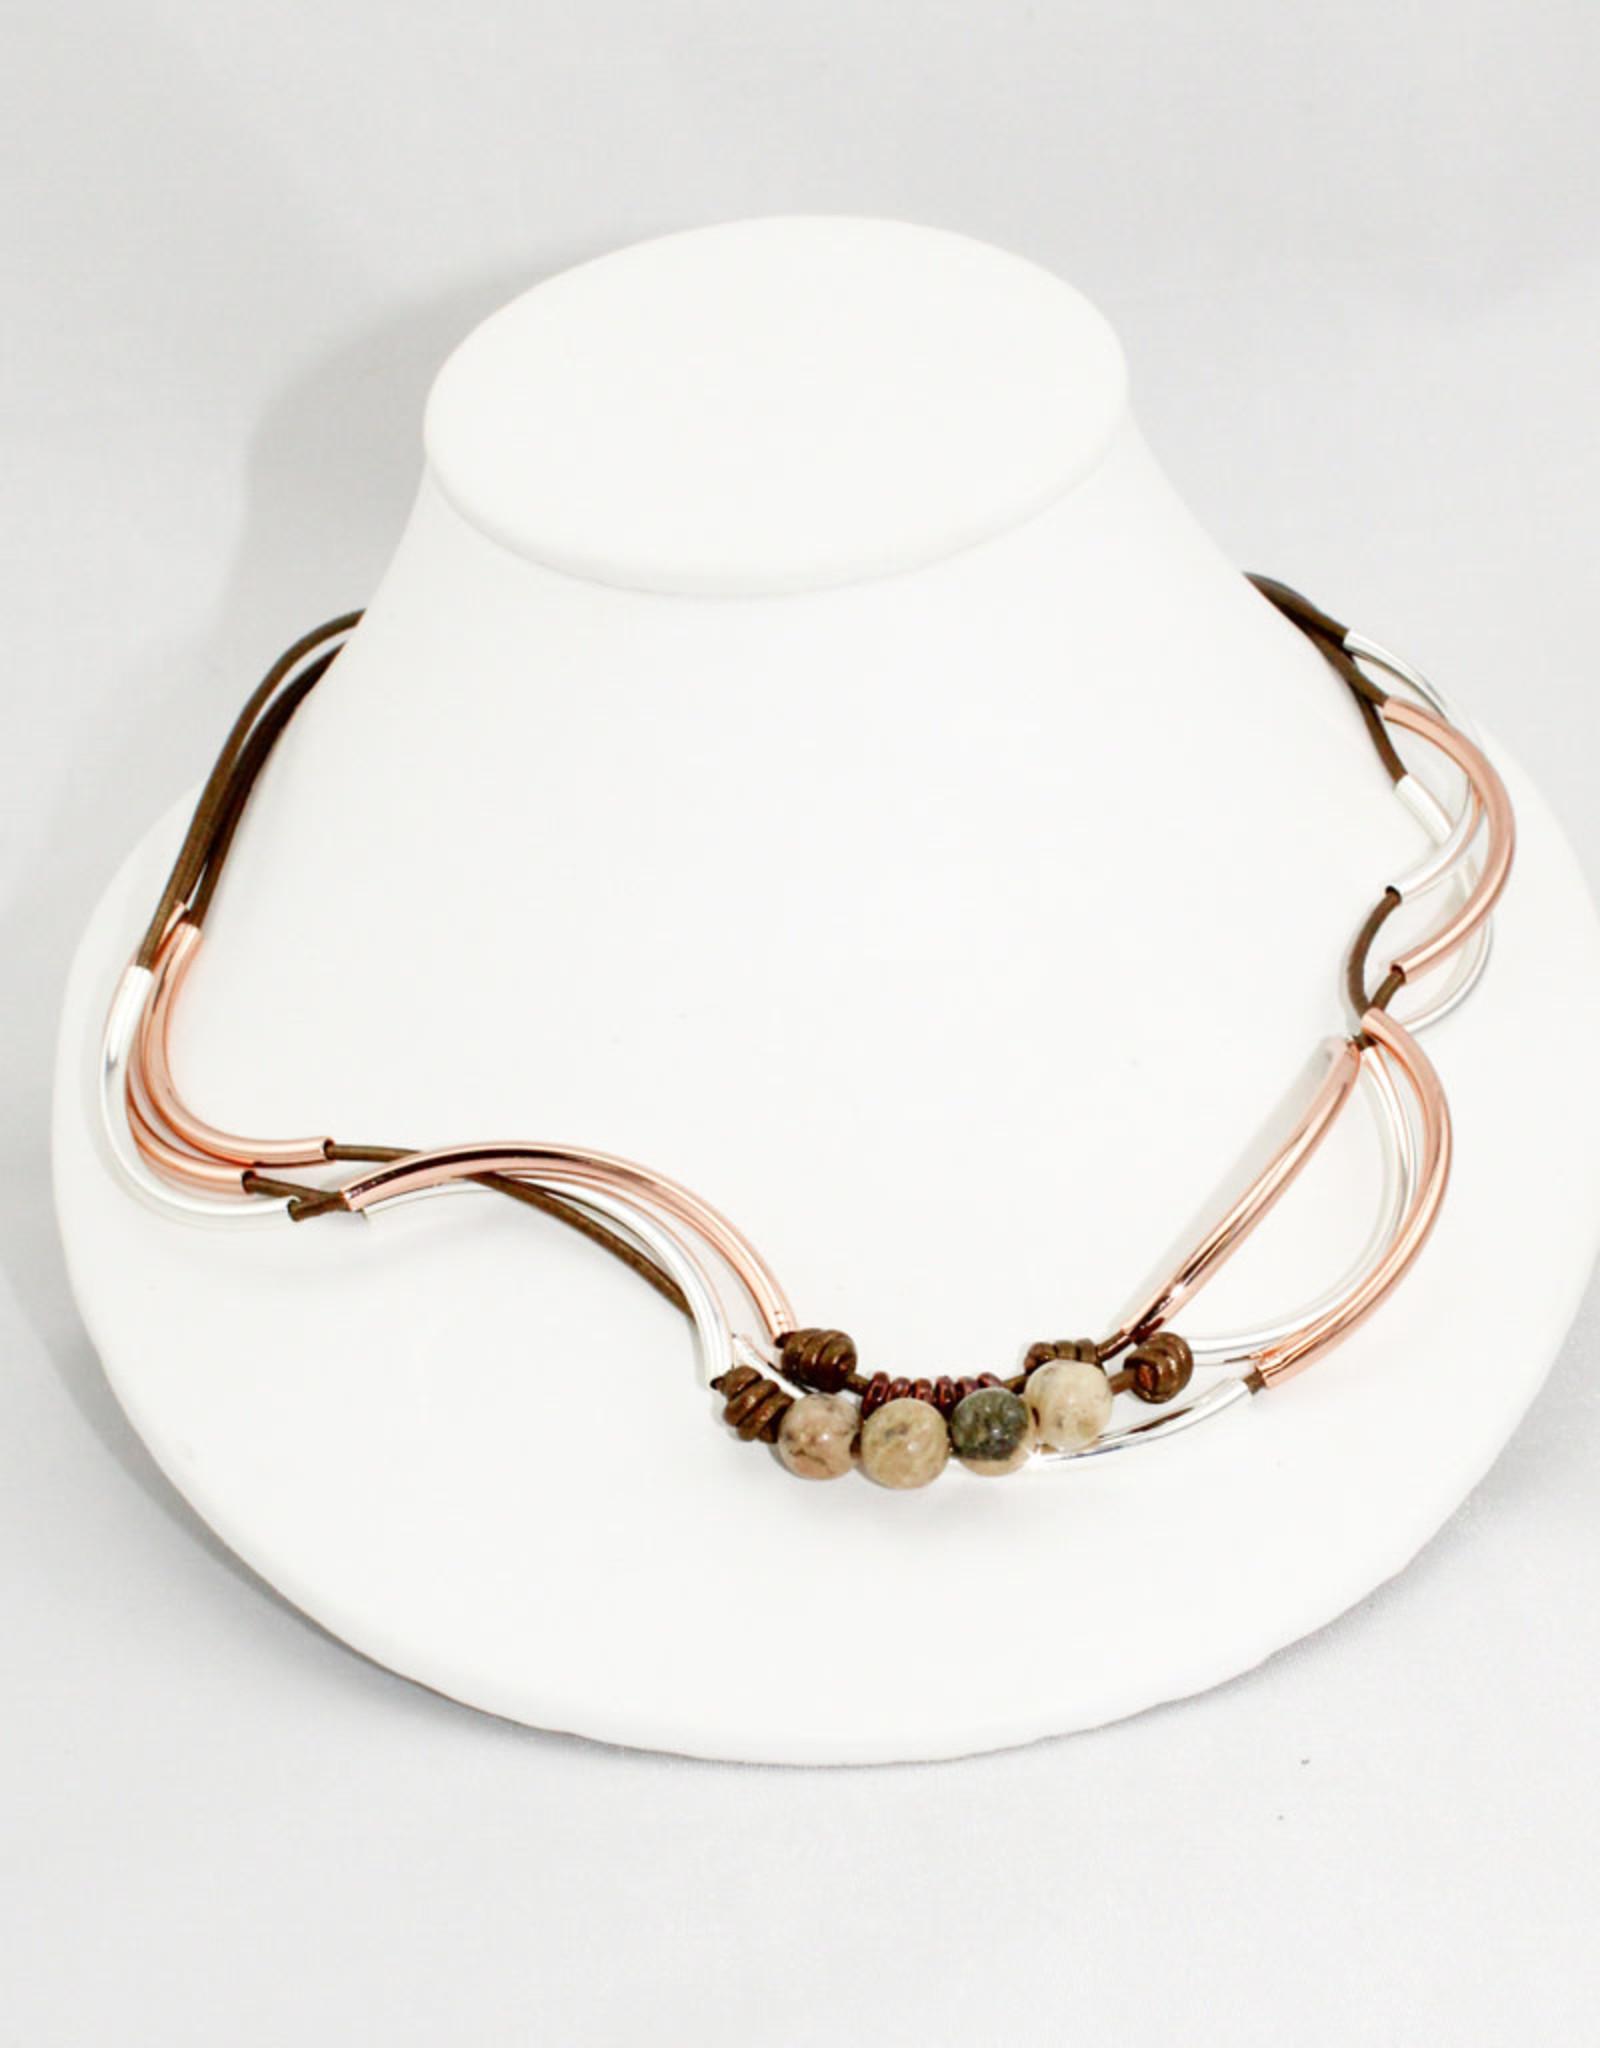 Lizzy James Madeline Met Bronze 3 Rose -GP-S Bracelet